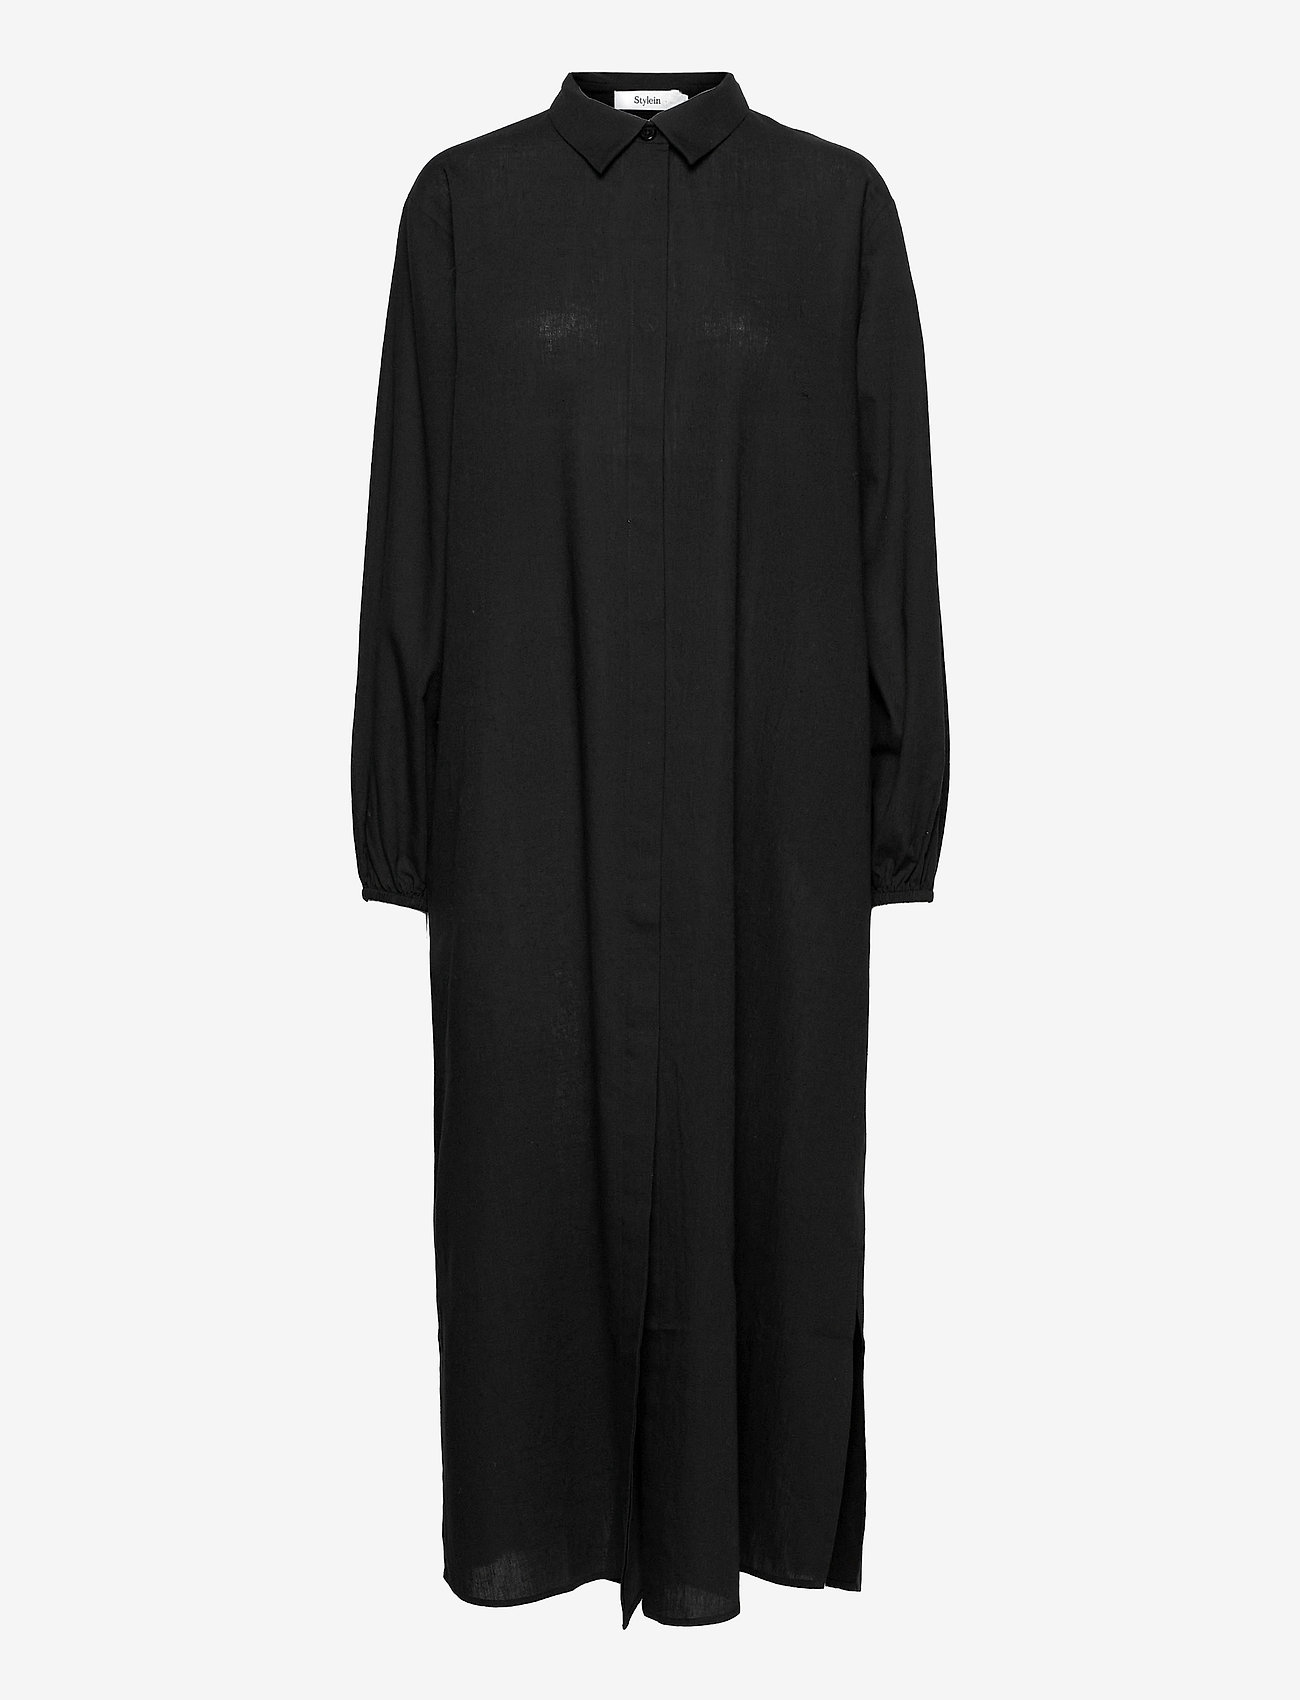 Stylein - SOUAL - maxi dresses - black - 1